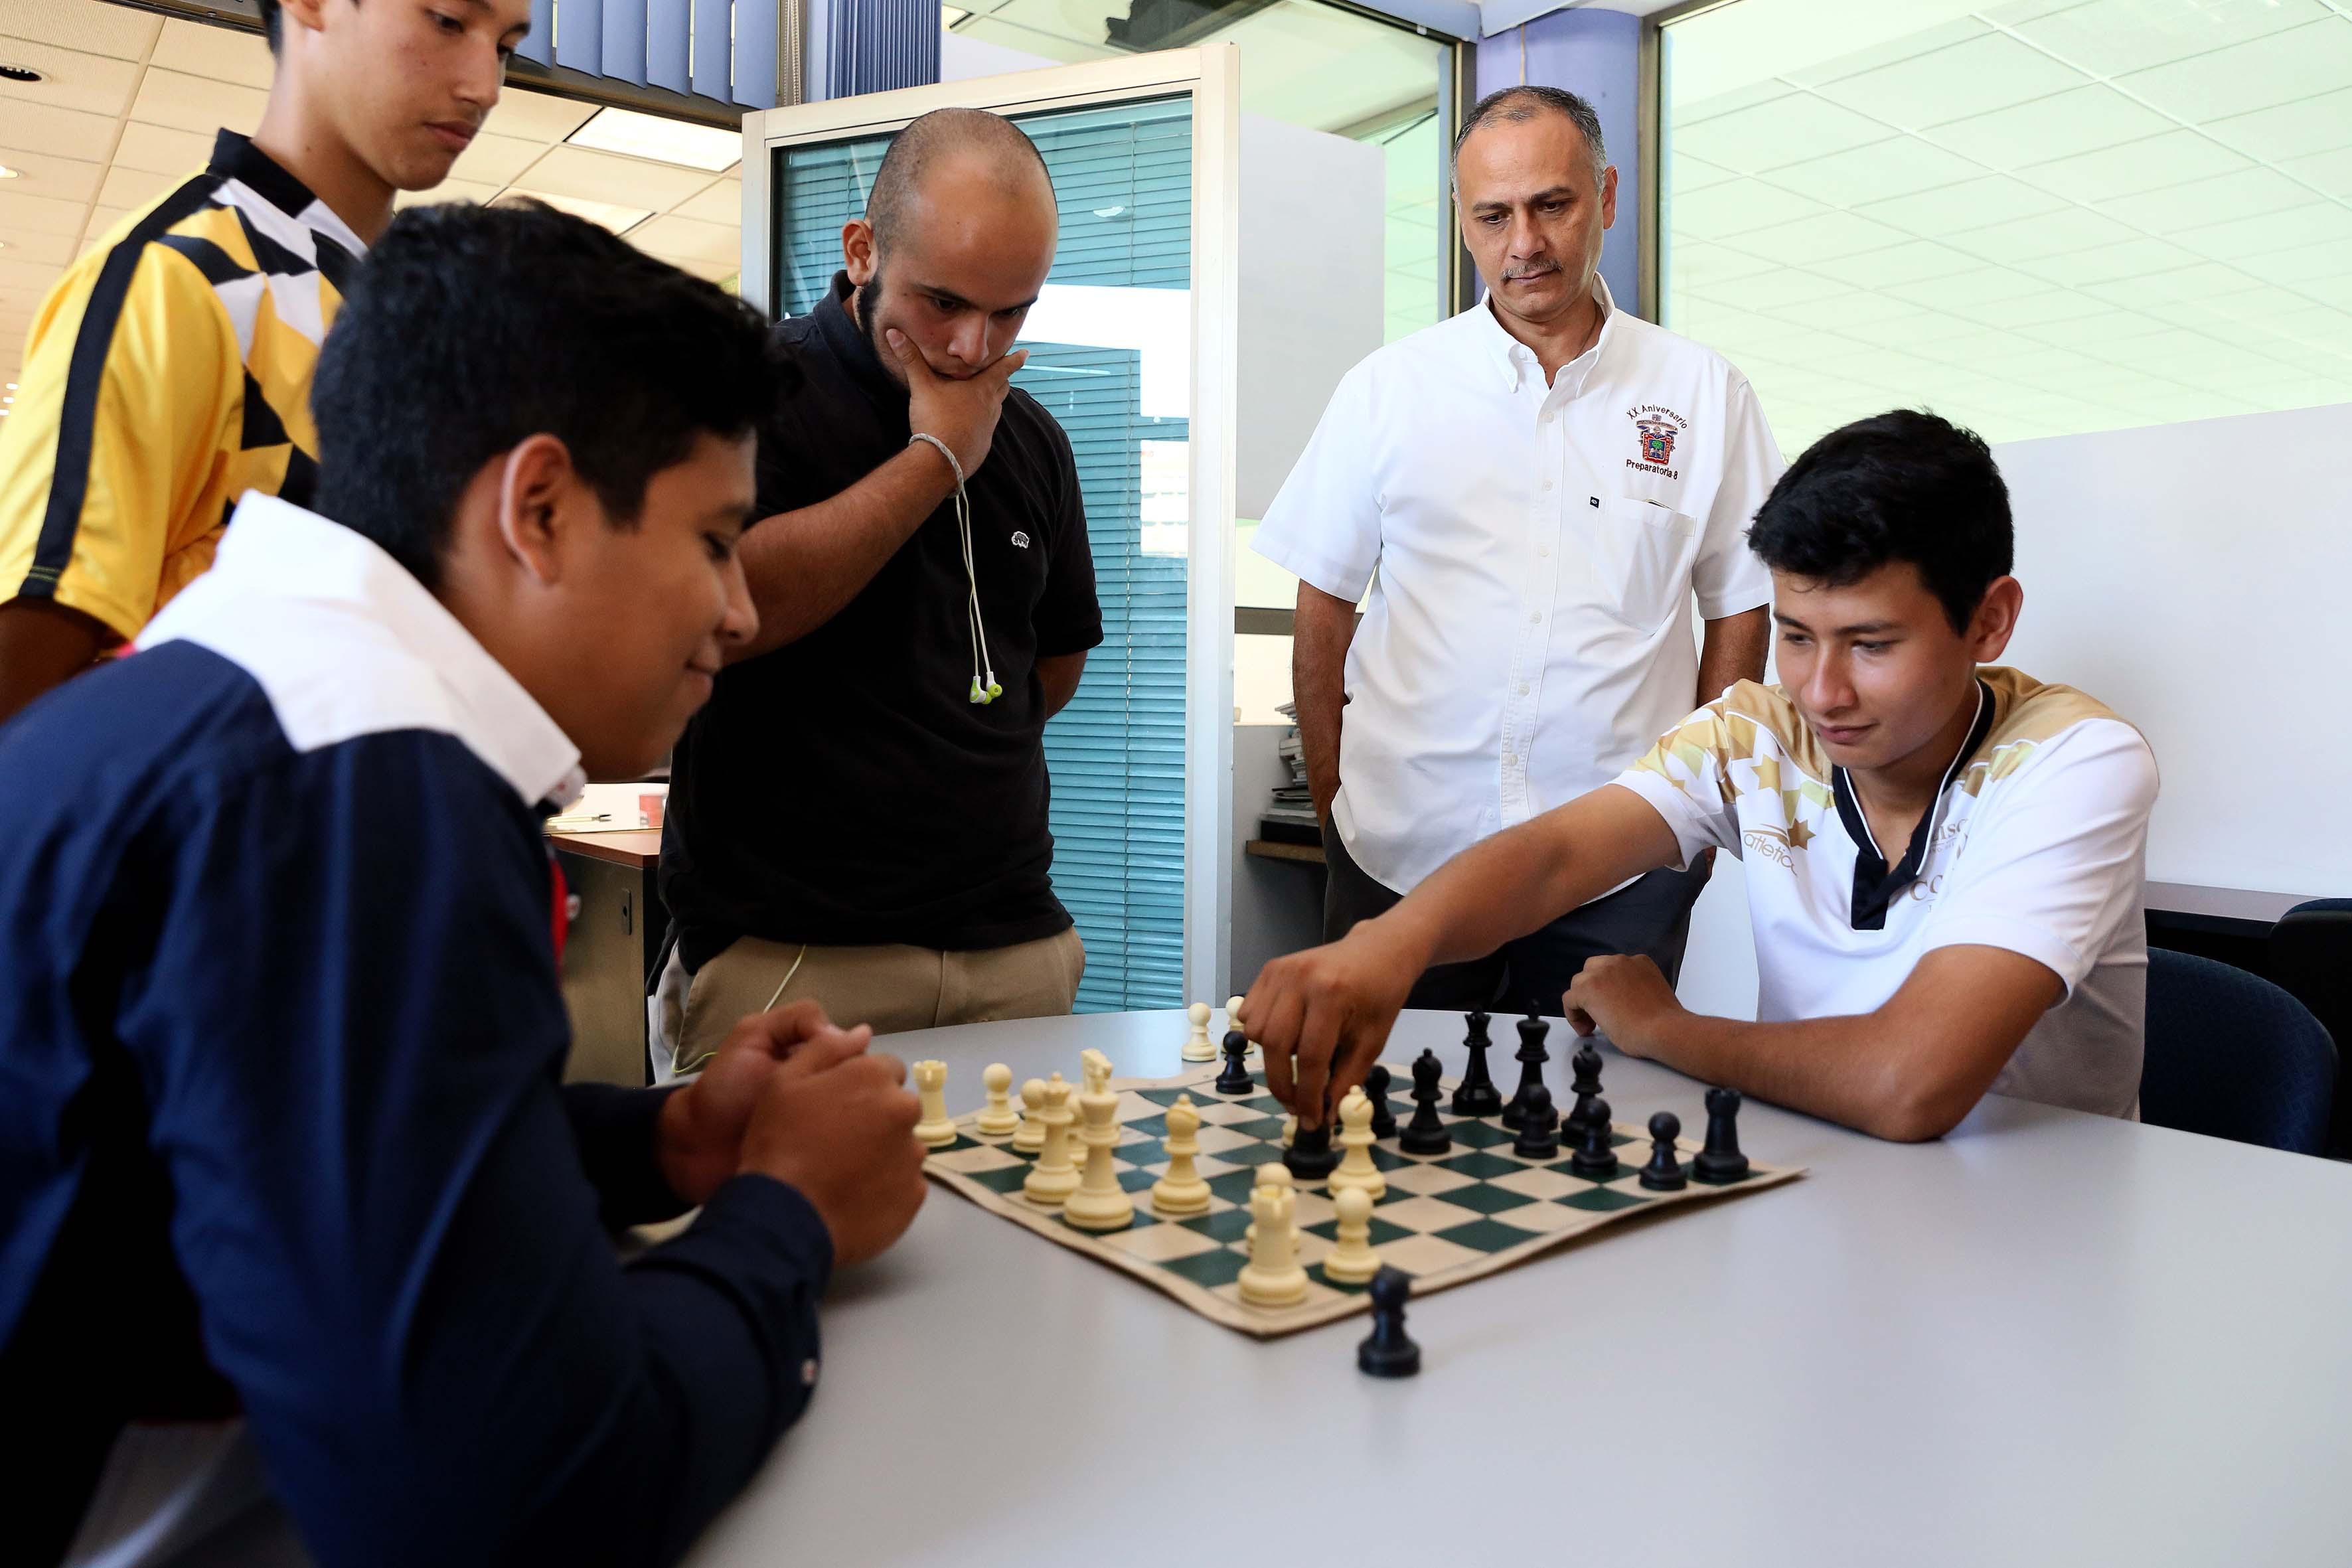 Jóvenes jugando ajedrez